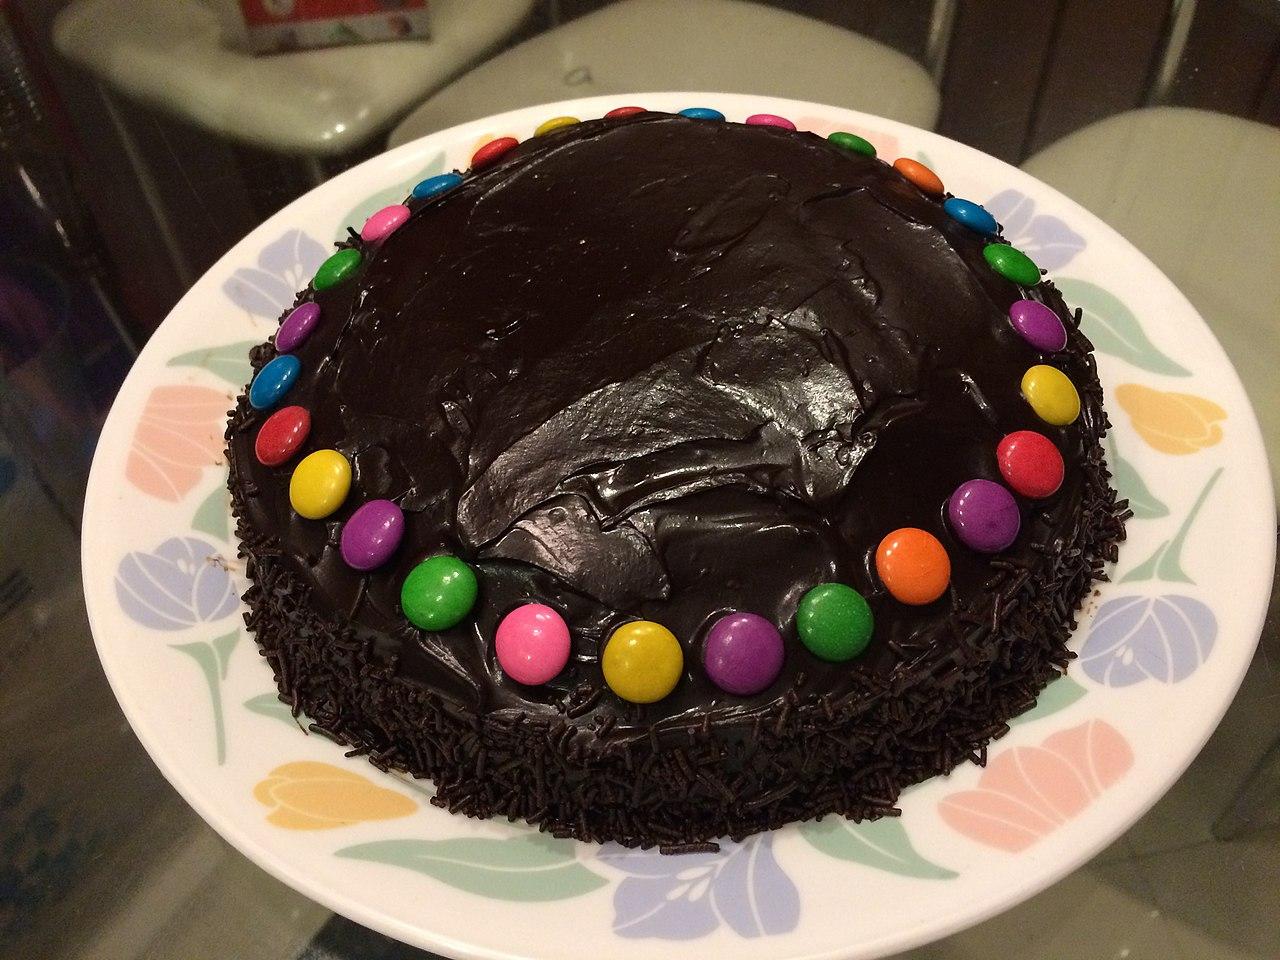 File:Homemade Chocolate cake for kids.JPG - Wikimedia Commons